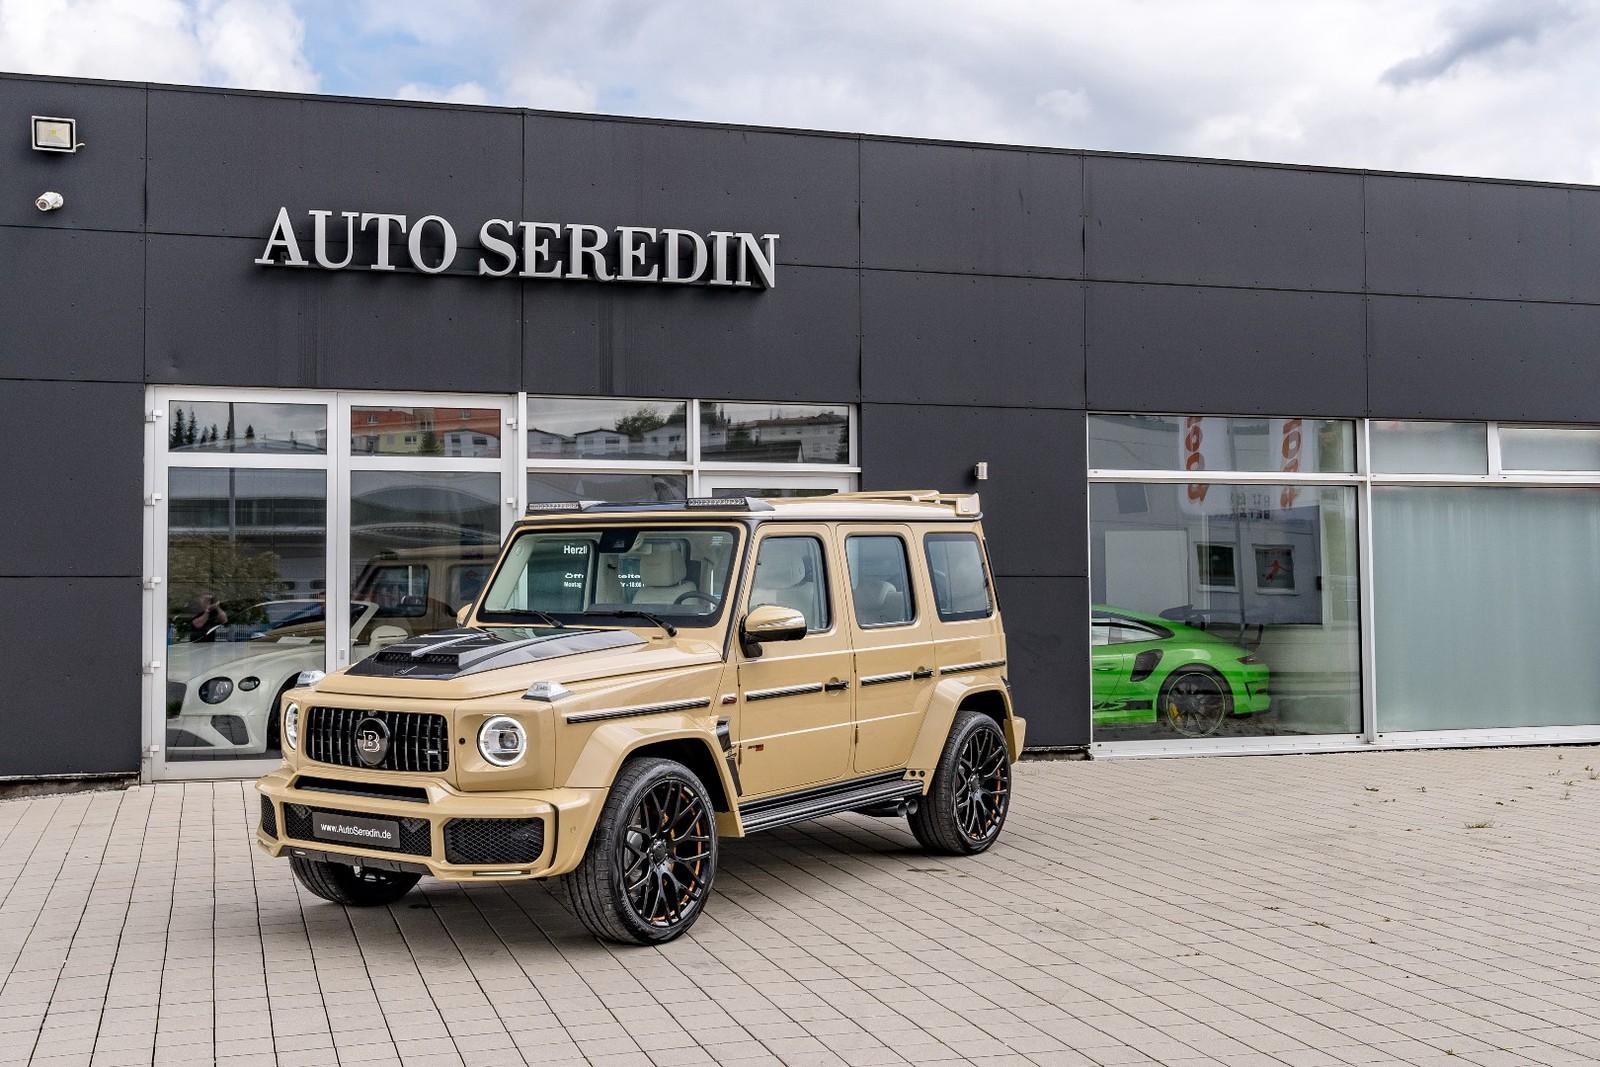 Mercedes Benz G 63 Amg New Buy In Hechingen Bei Stuttgart Price 320110 Eur Int Nr 2171 Sold